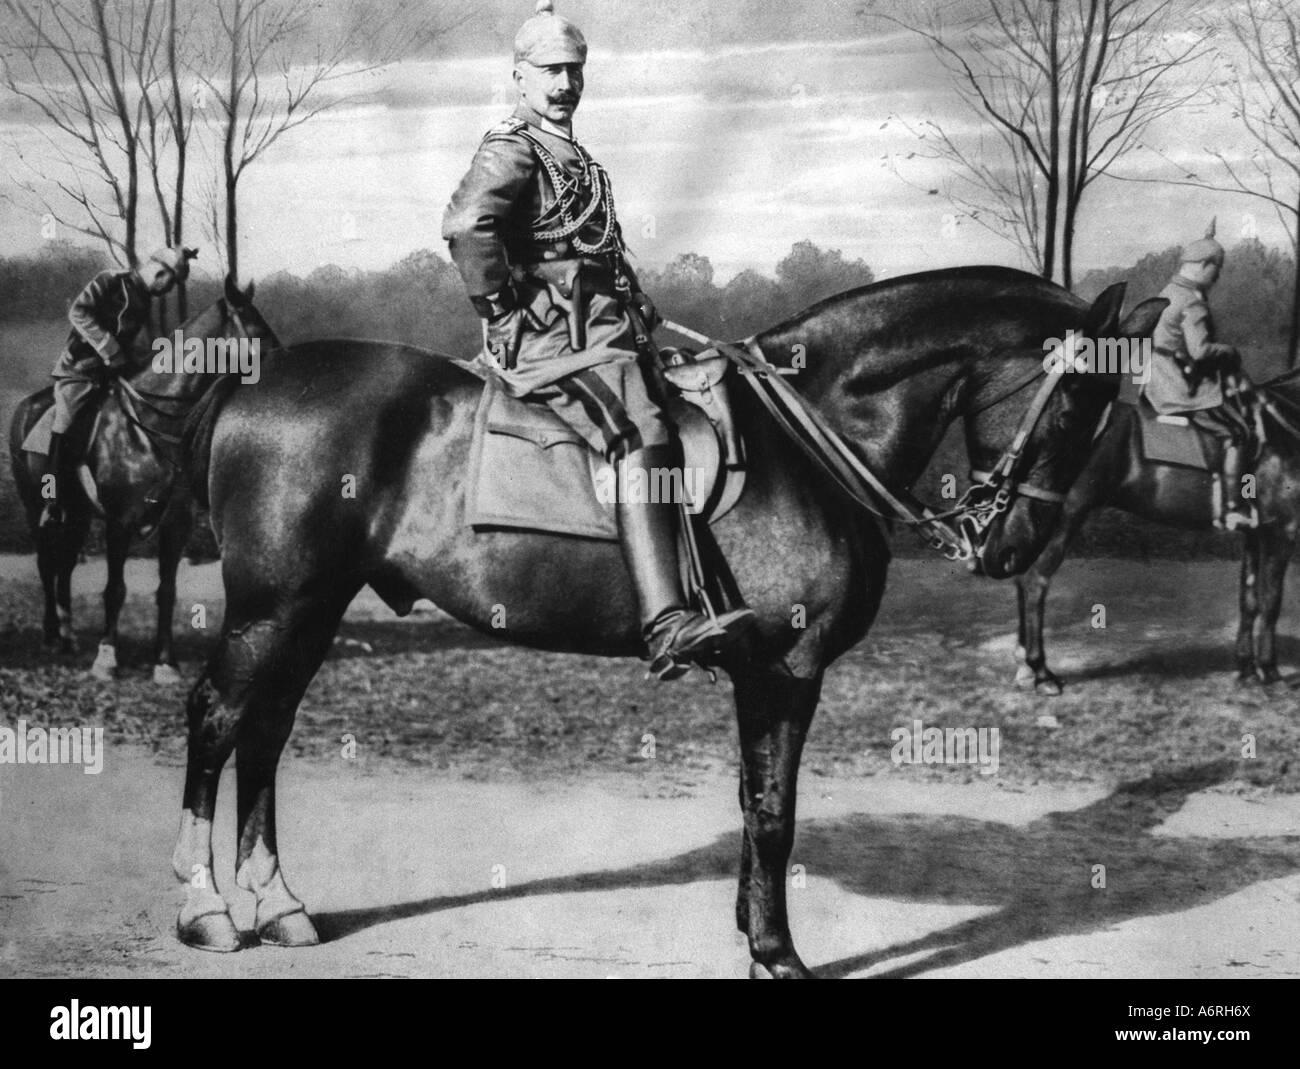 William II, 27.1.1859 - 4.6.1941, German Emperor, 15.6.1888 - 9.11.1918, full length, sitting, horse, 1914, riding, uniform, mil Stock Photo